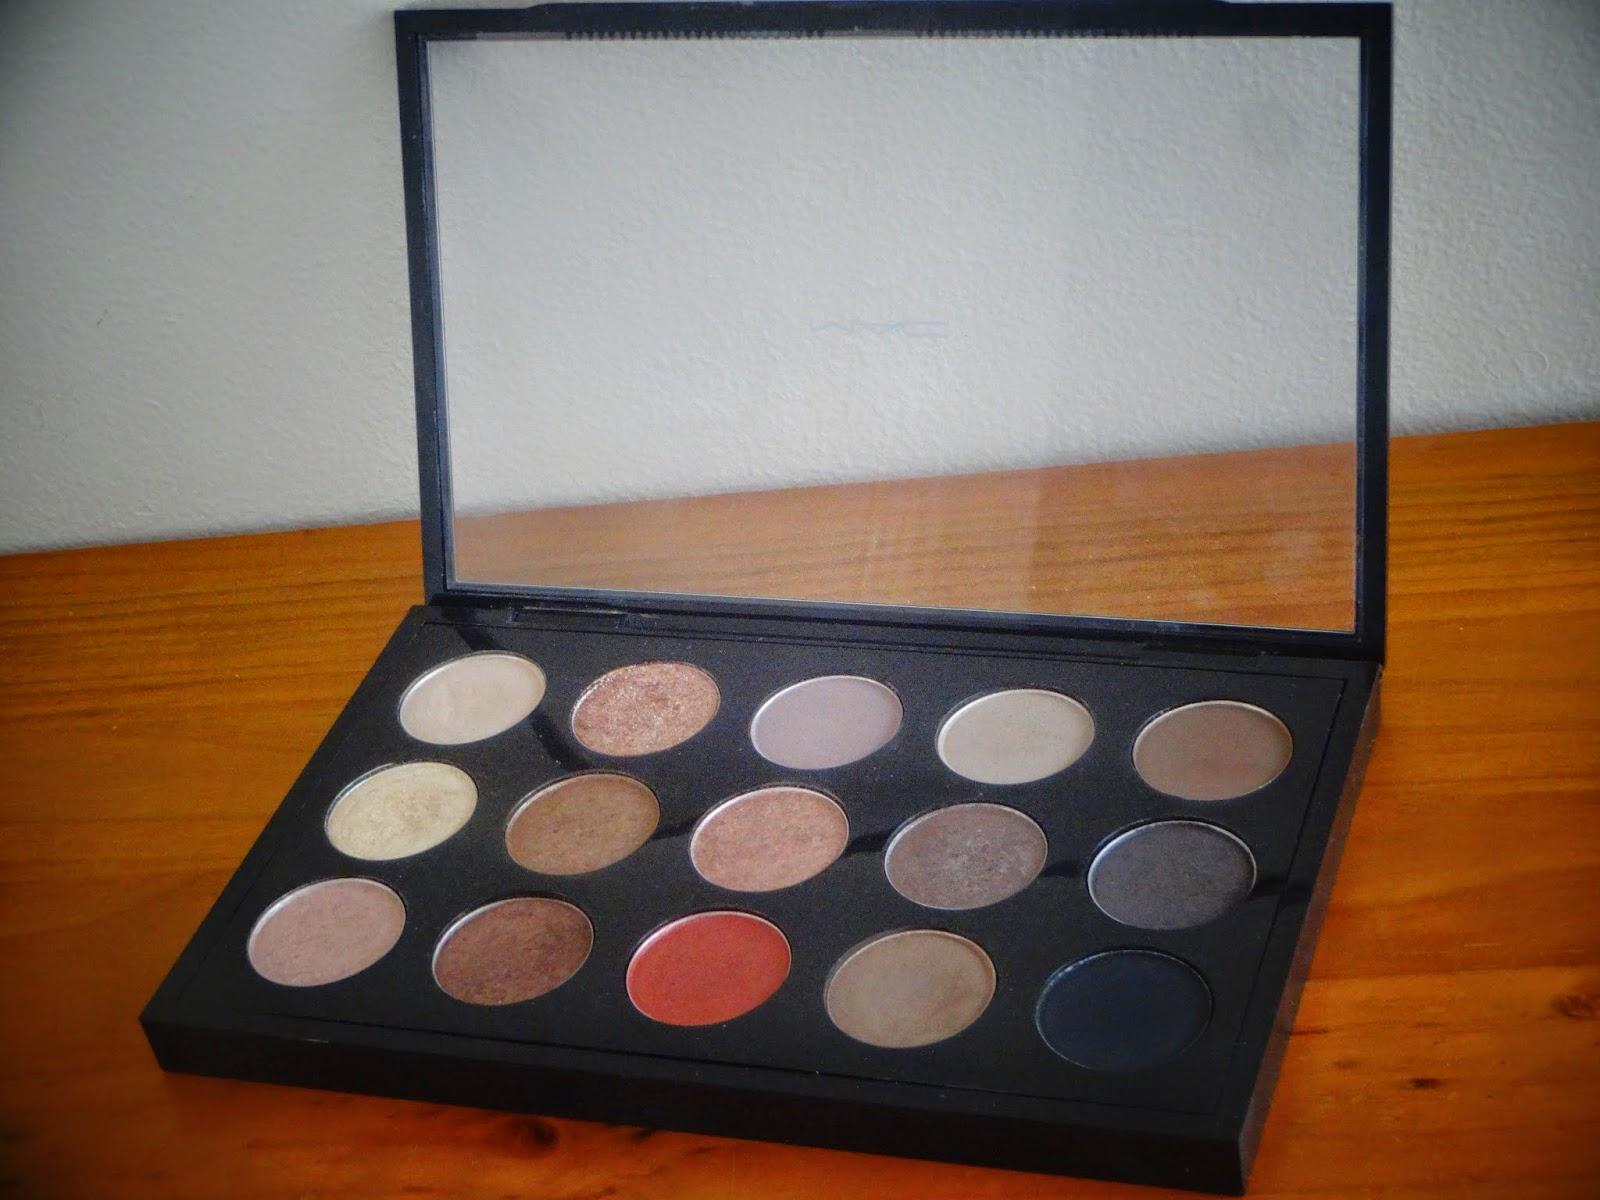 My MAC Eye Shadow Collection